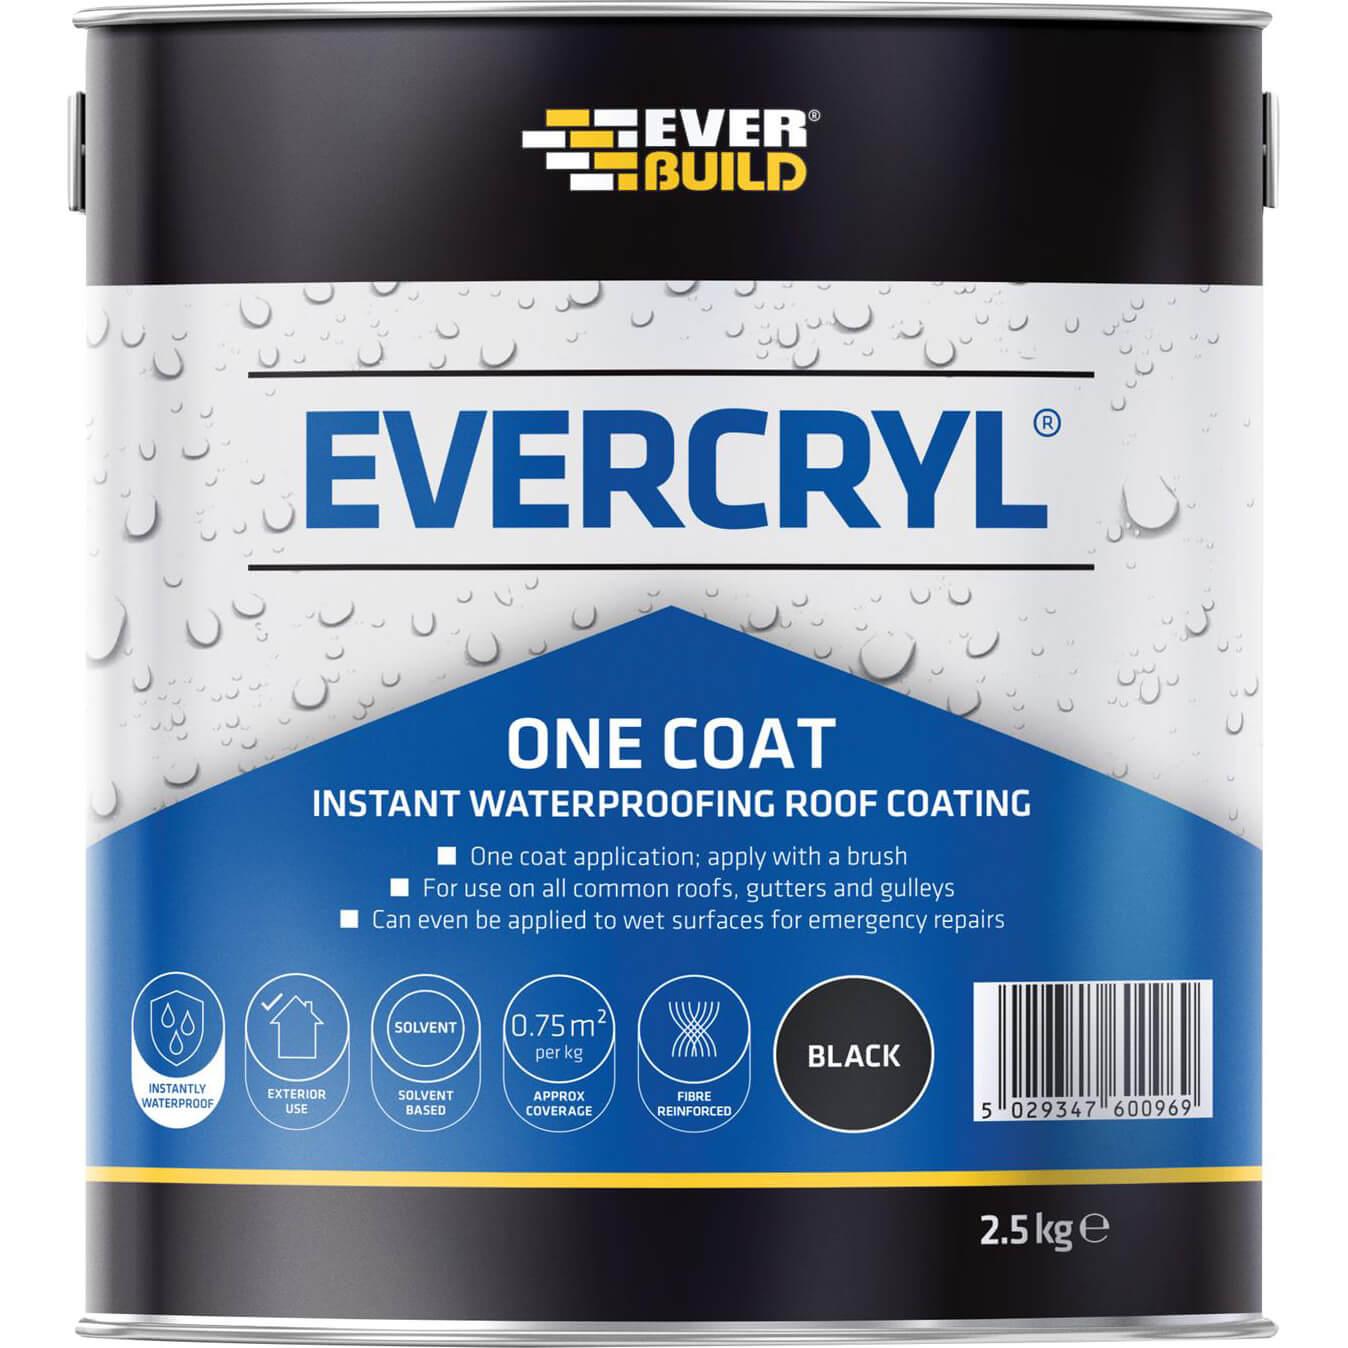 Everbuild Evercryl One Coat Black 2.5kg